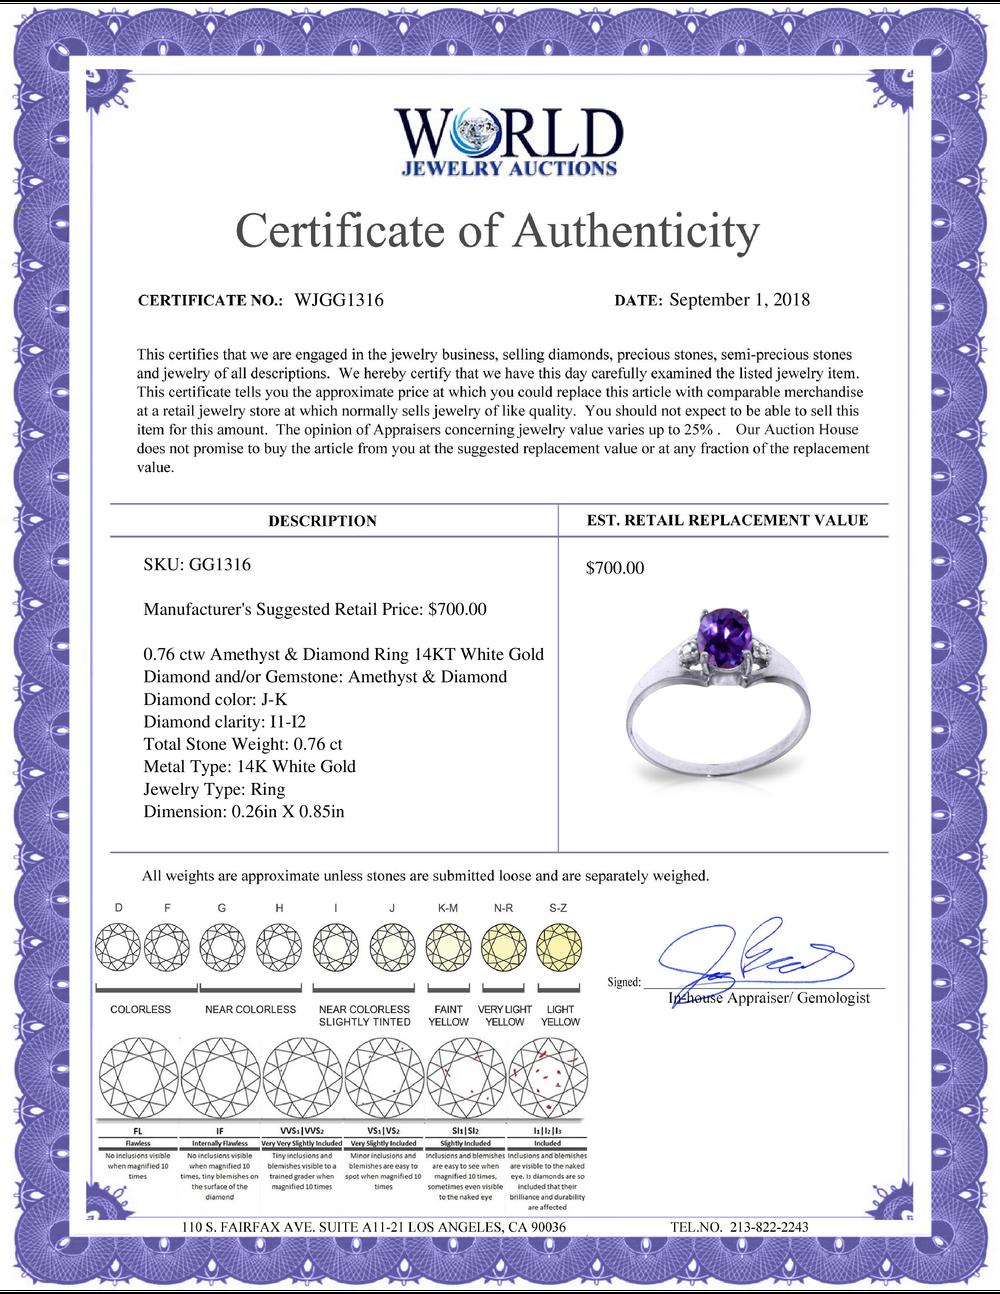 Lot 4069: Genuine 0.76 ctw Amethyst & Diamond Ring Jewelry 14KT White Gold - REF-20R8P